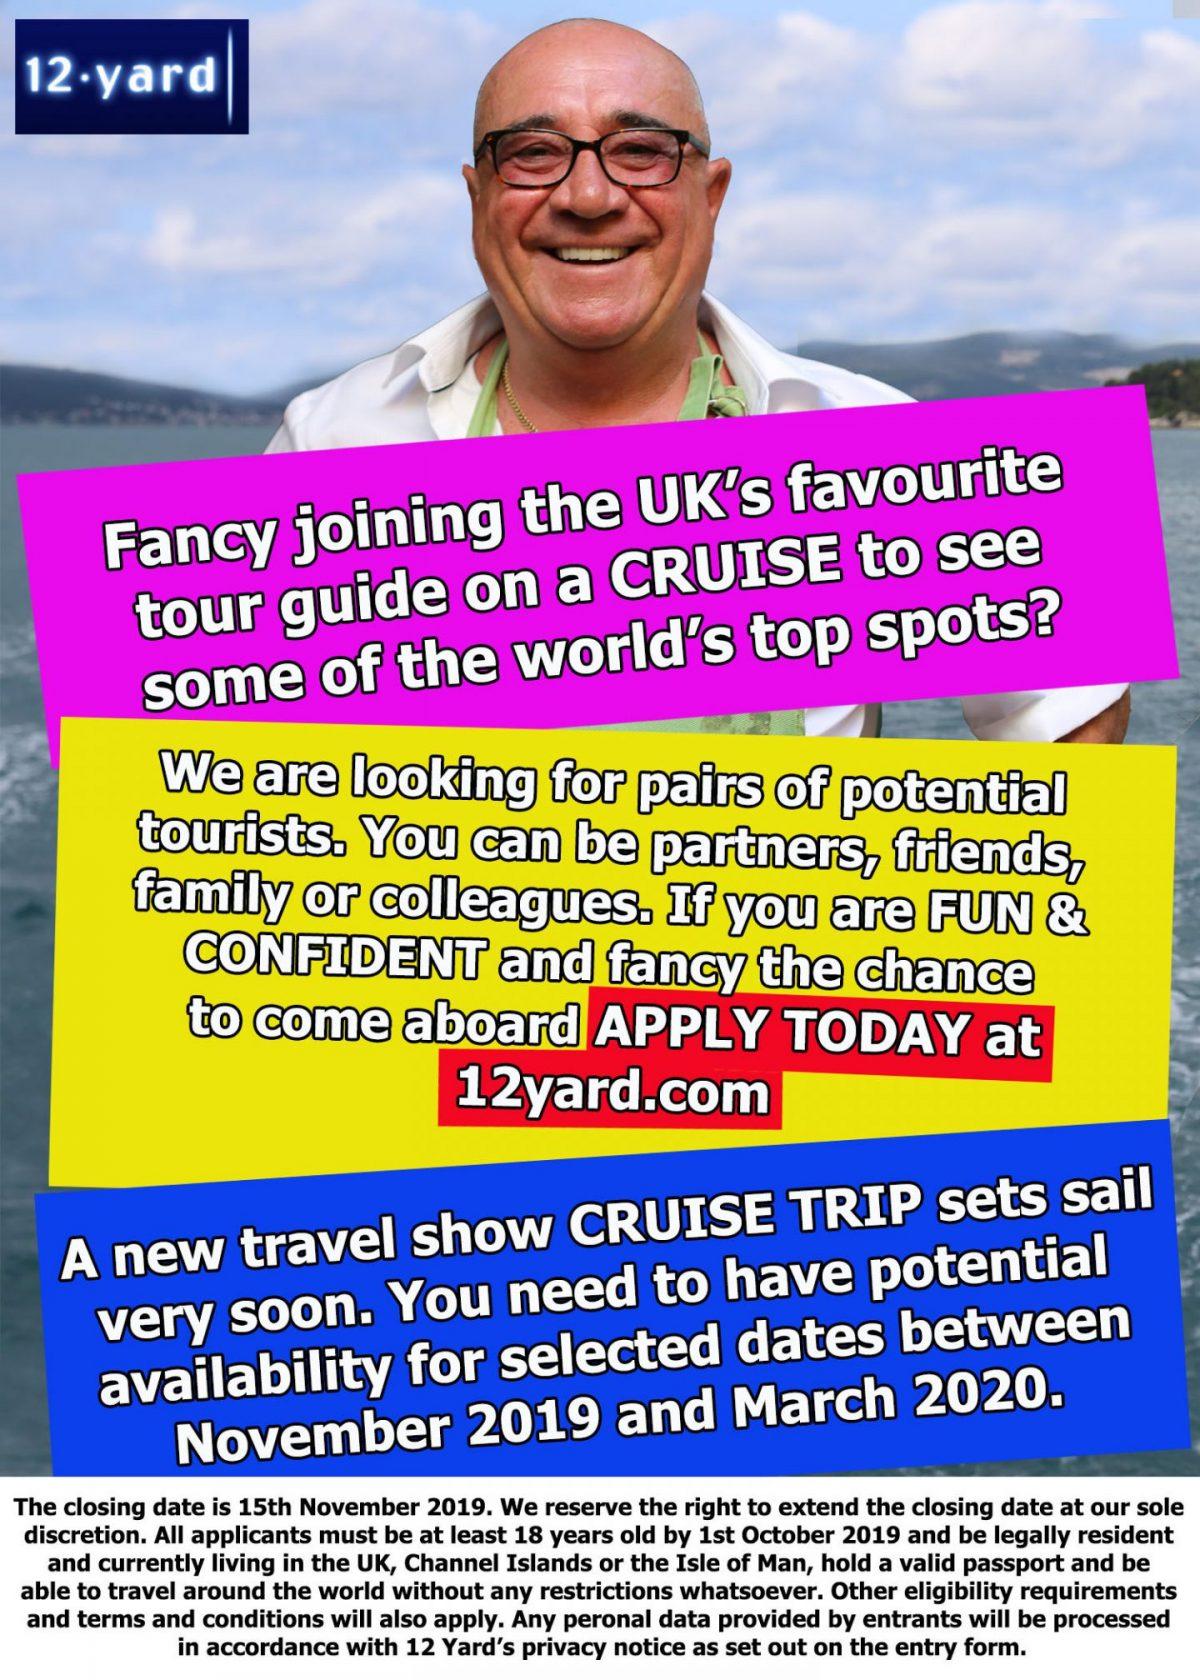 New travel show CRUISE TRIP sets sail very soon.